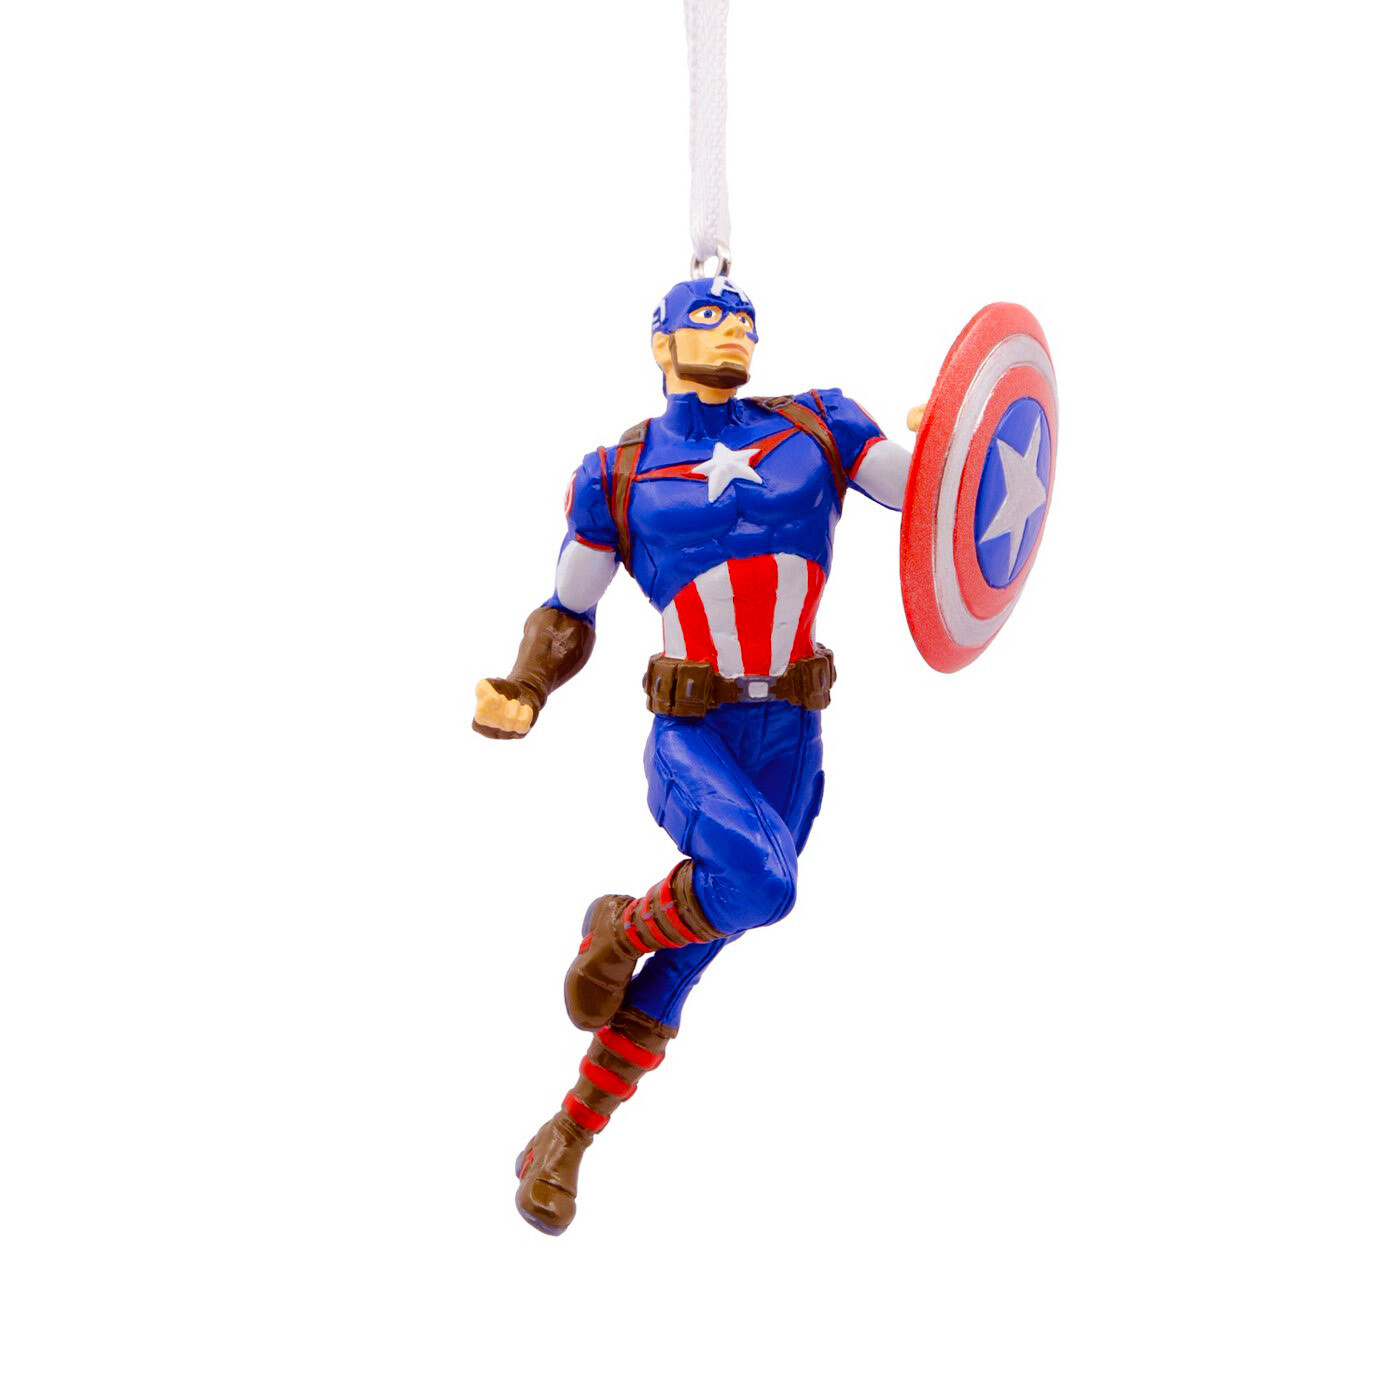 Captain America Avengers Marvel Hallmark Christmas Tree Holiday Ornament